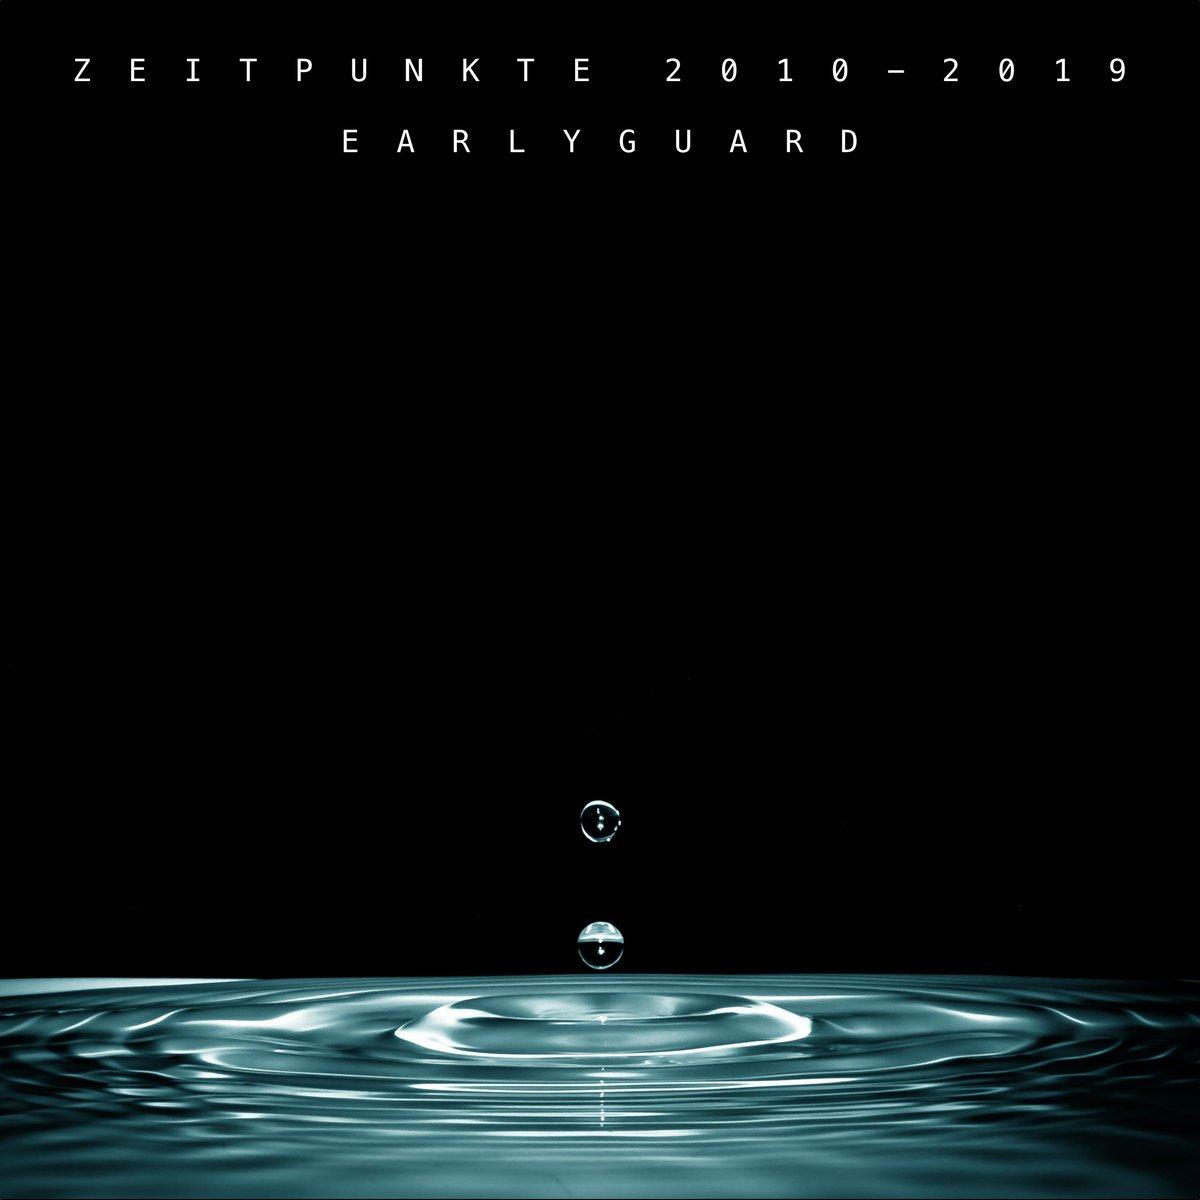 earlyguard_zeitpunkte